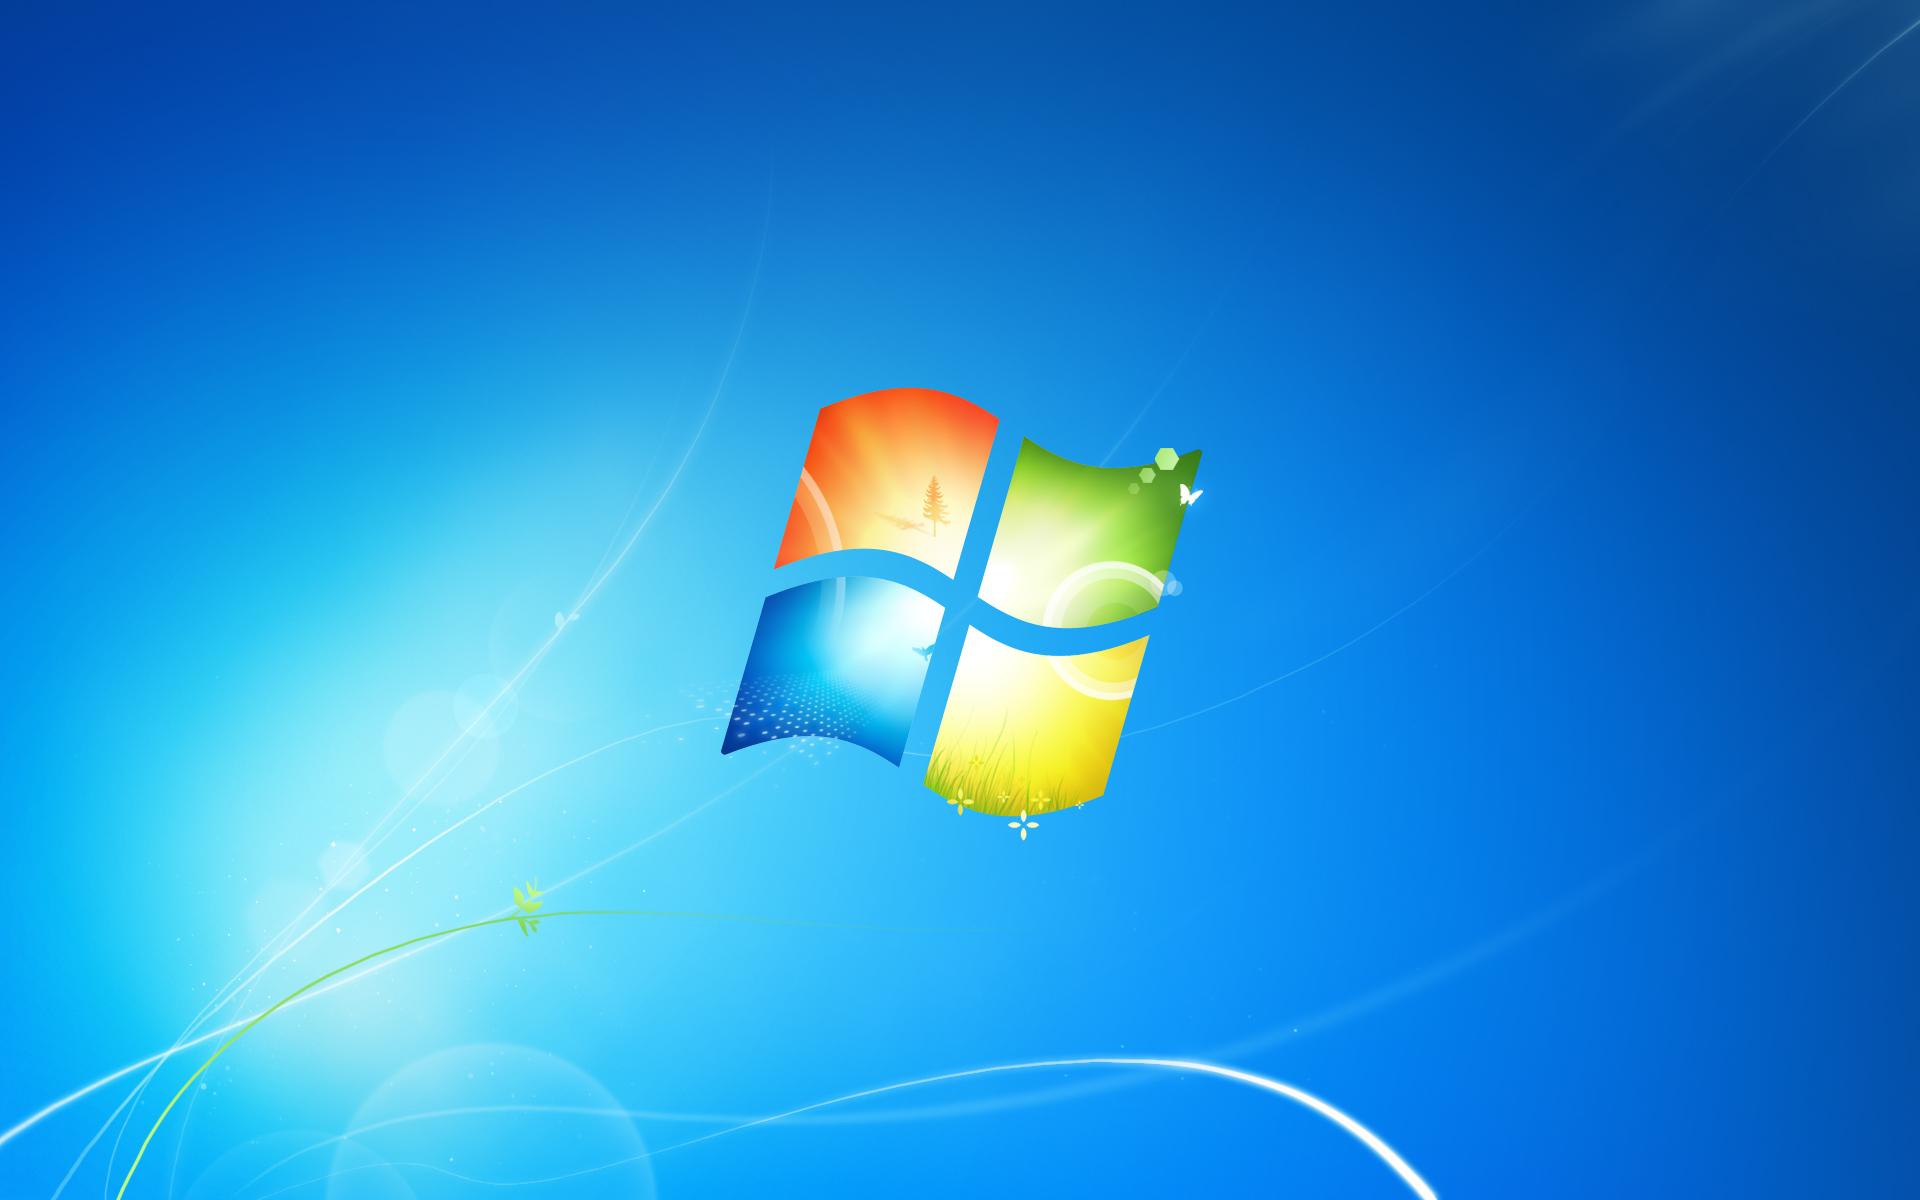 Sfondi Desktop Windows 7 Natalizi.Sfondi Per Windows Sfondissimo Sfondi Screensaver Gratis